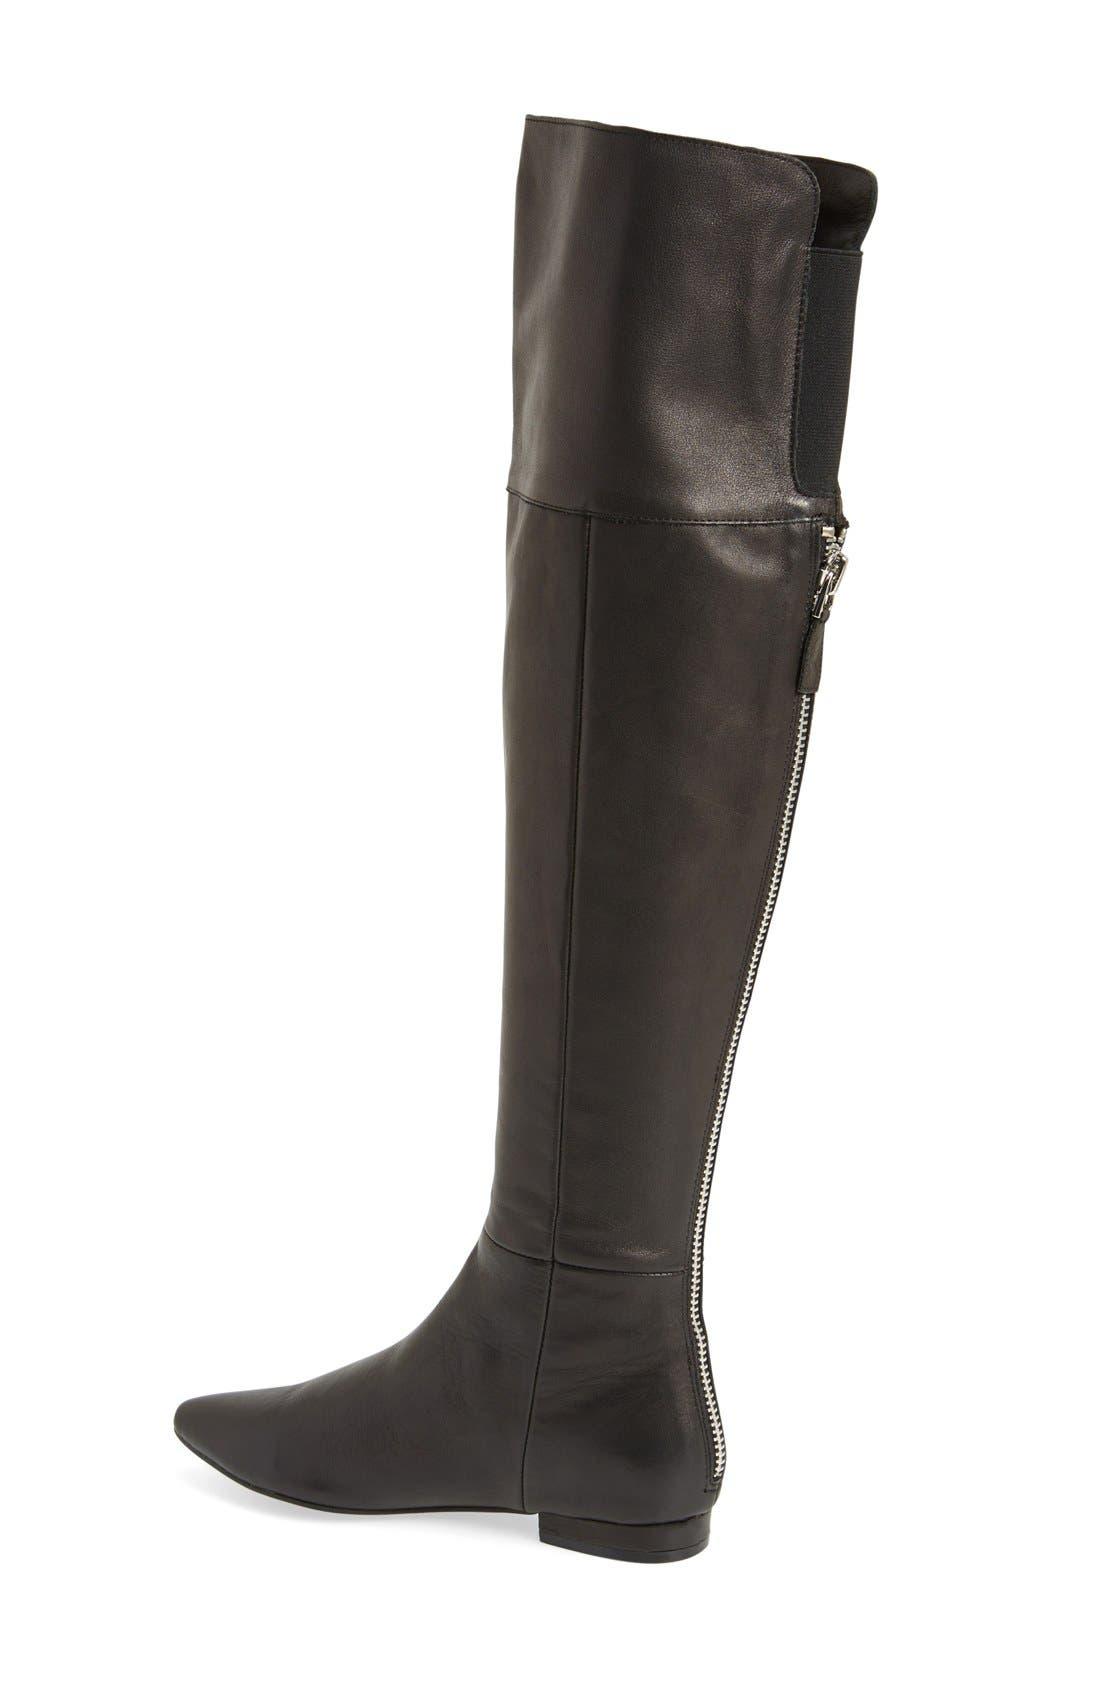 Alternate Image 2  - Kristin Cavallari'York' Over the Knee Boot (Women)